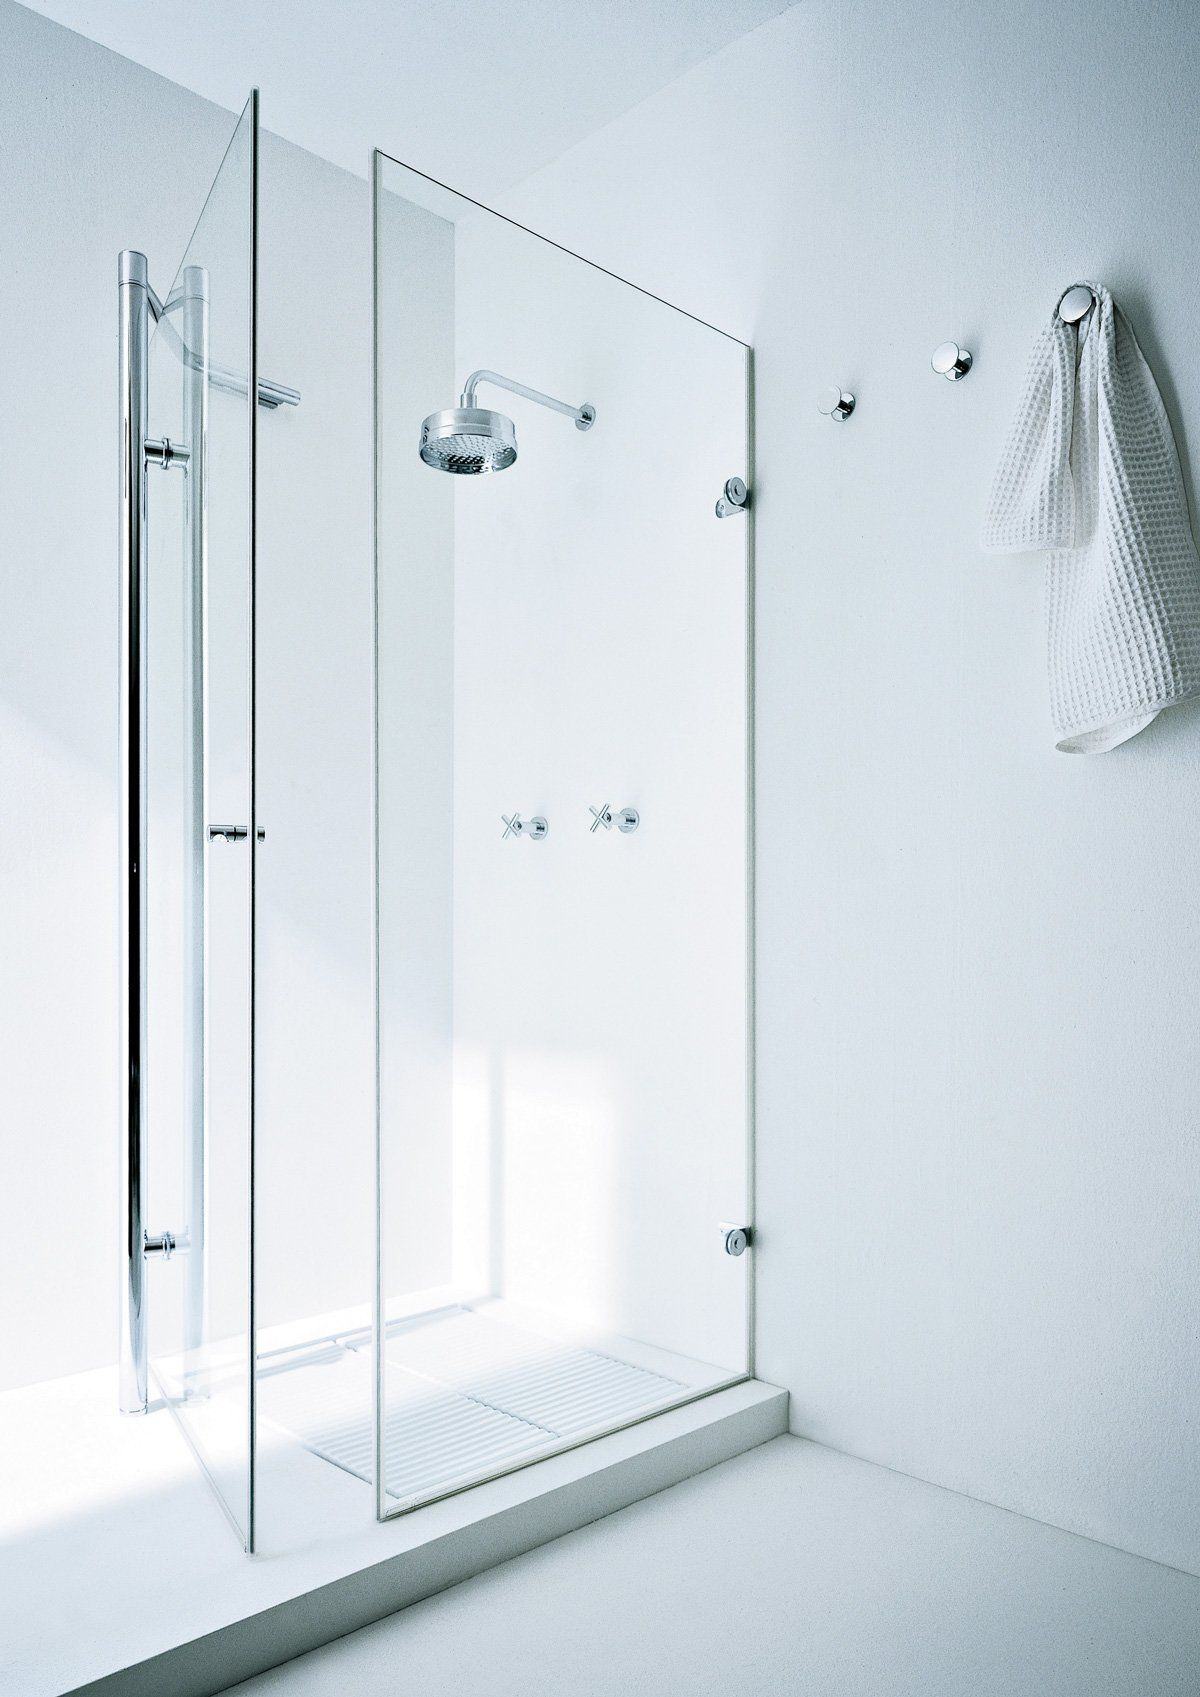 flaminia duschabtrennungen duschabtrennung bamboo designbest. Black Bedroom Furniture Sets. Home Design Ideas